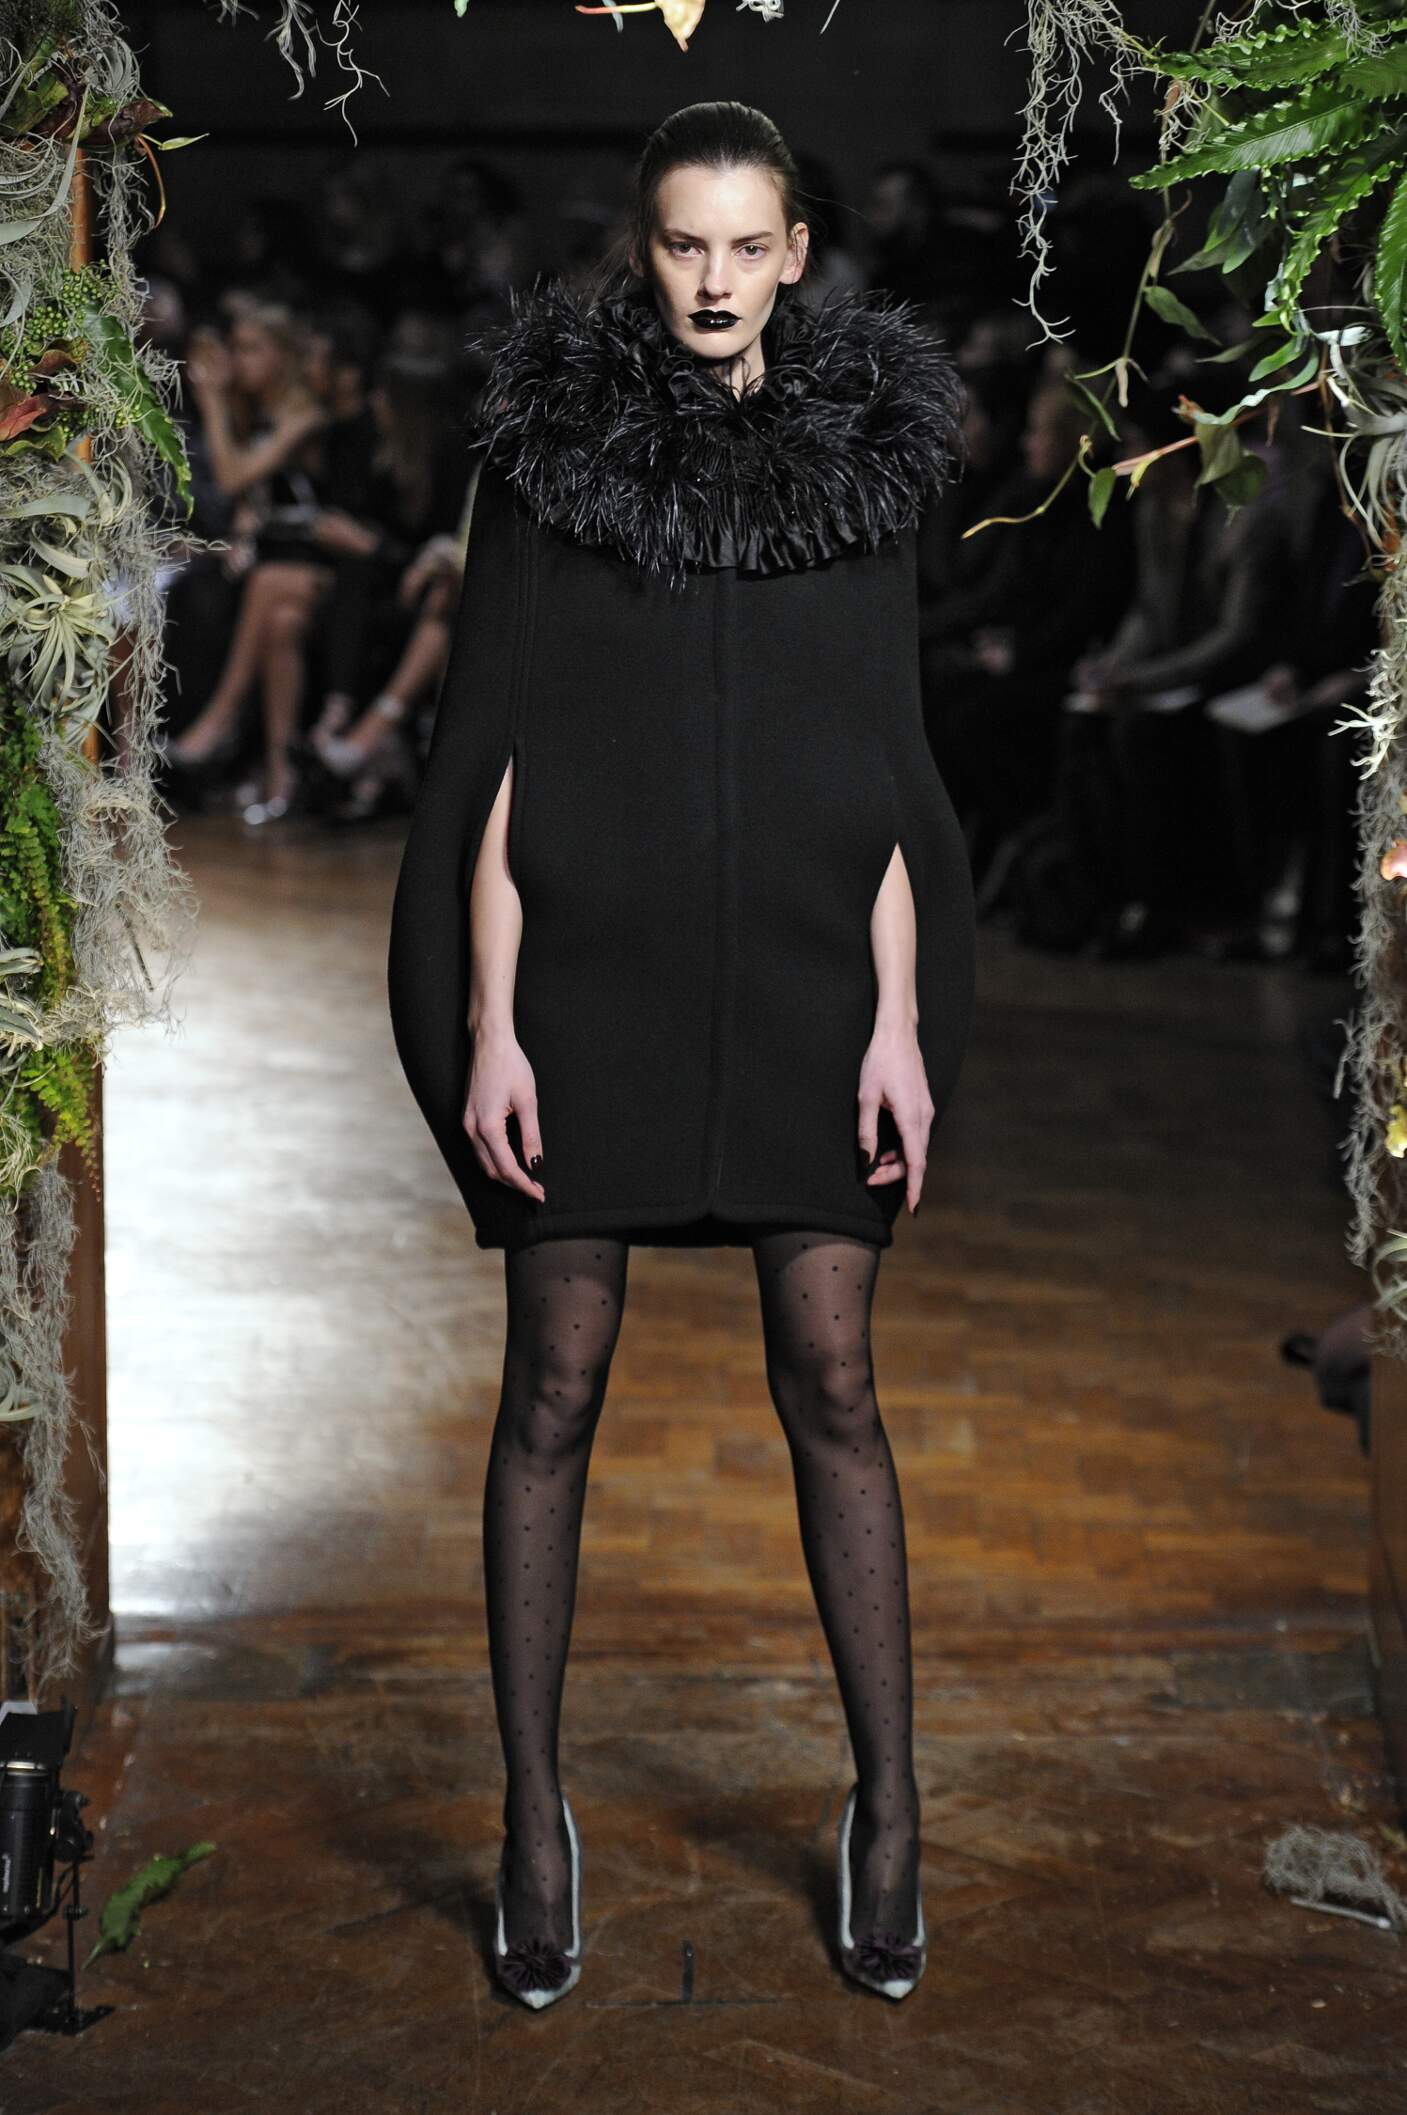 Giles Fall Winter 2015 16 Womenswear Collection London Fashion Week Fashion Show